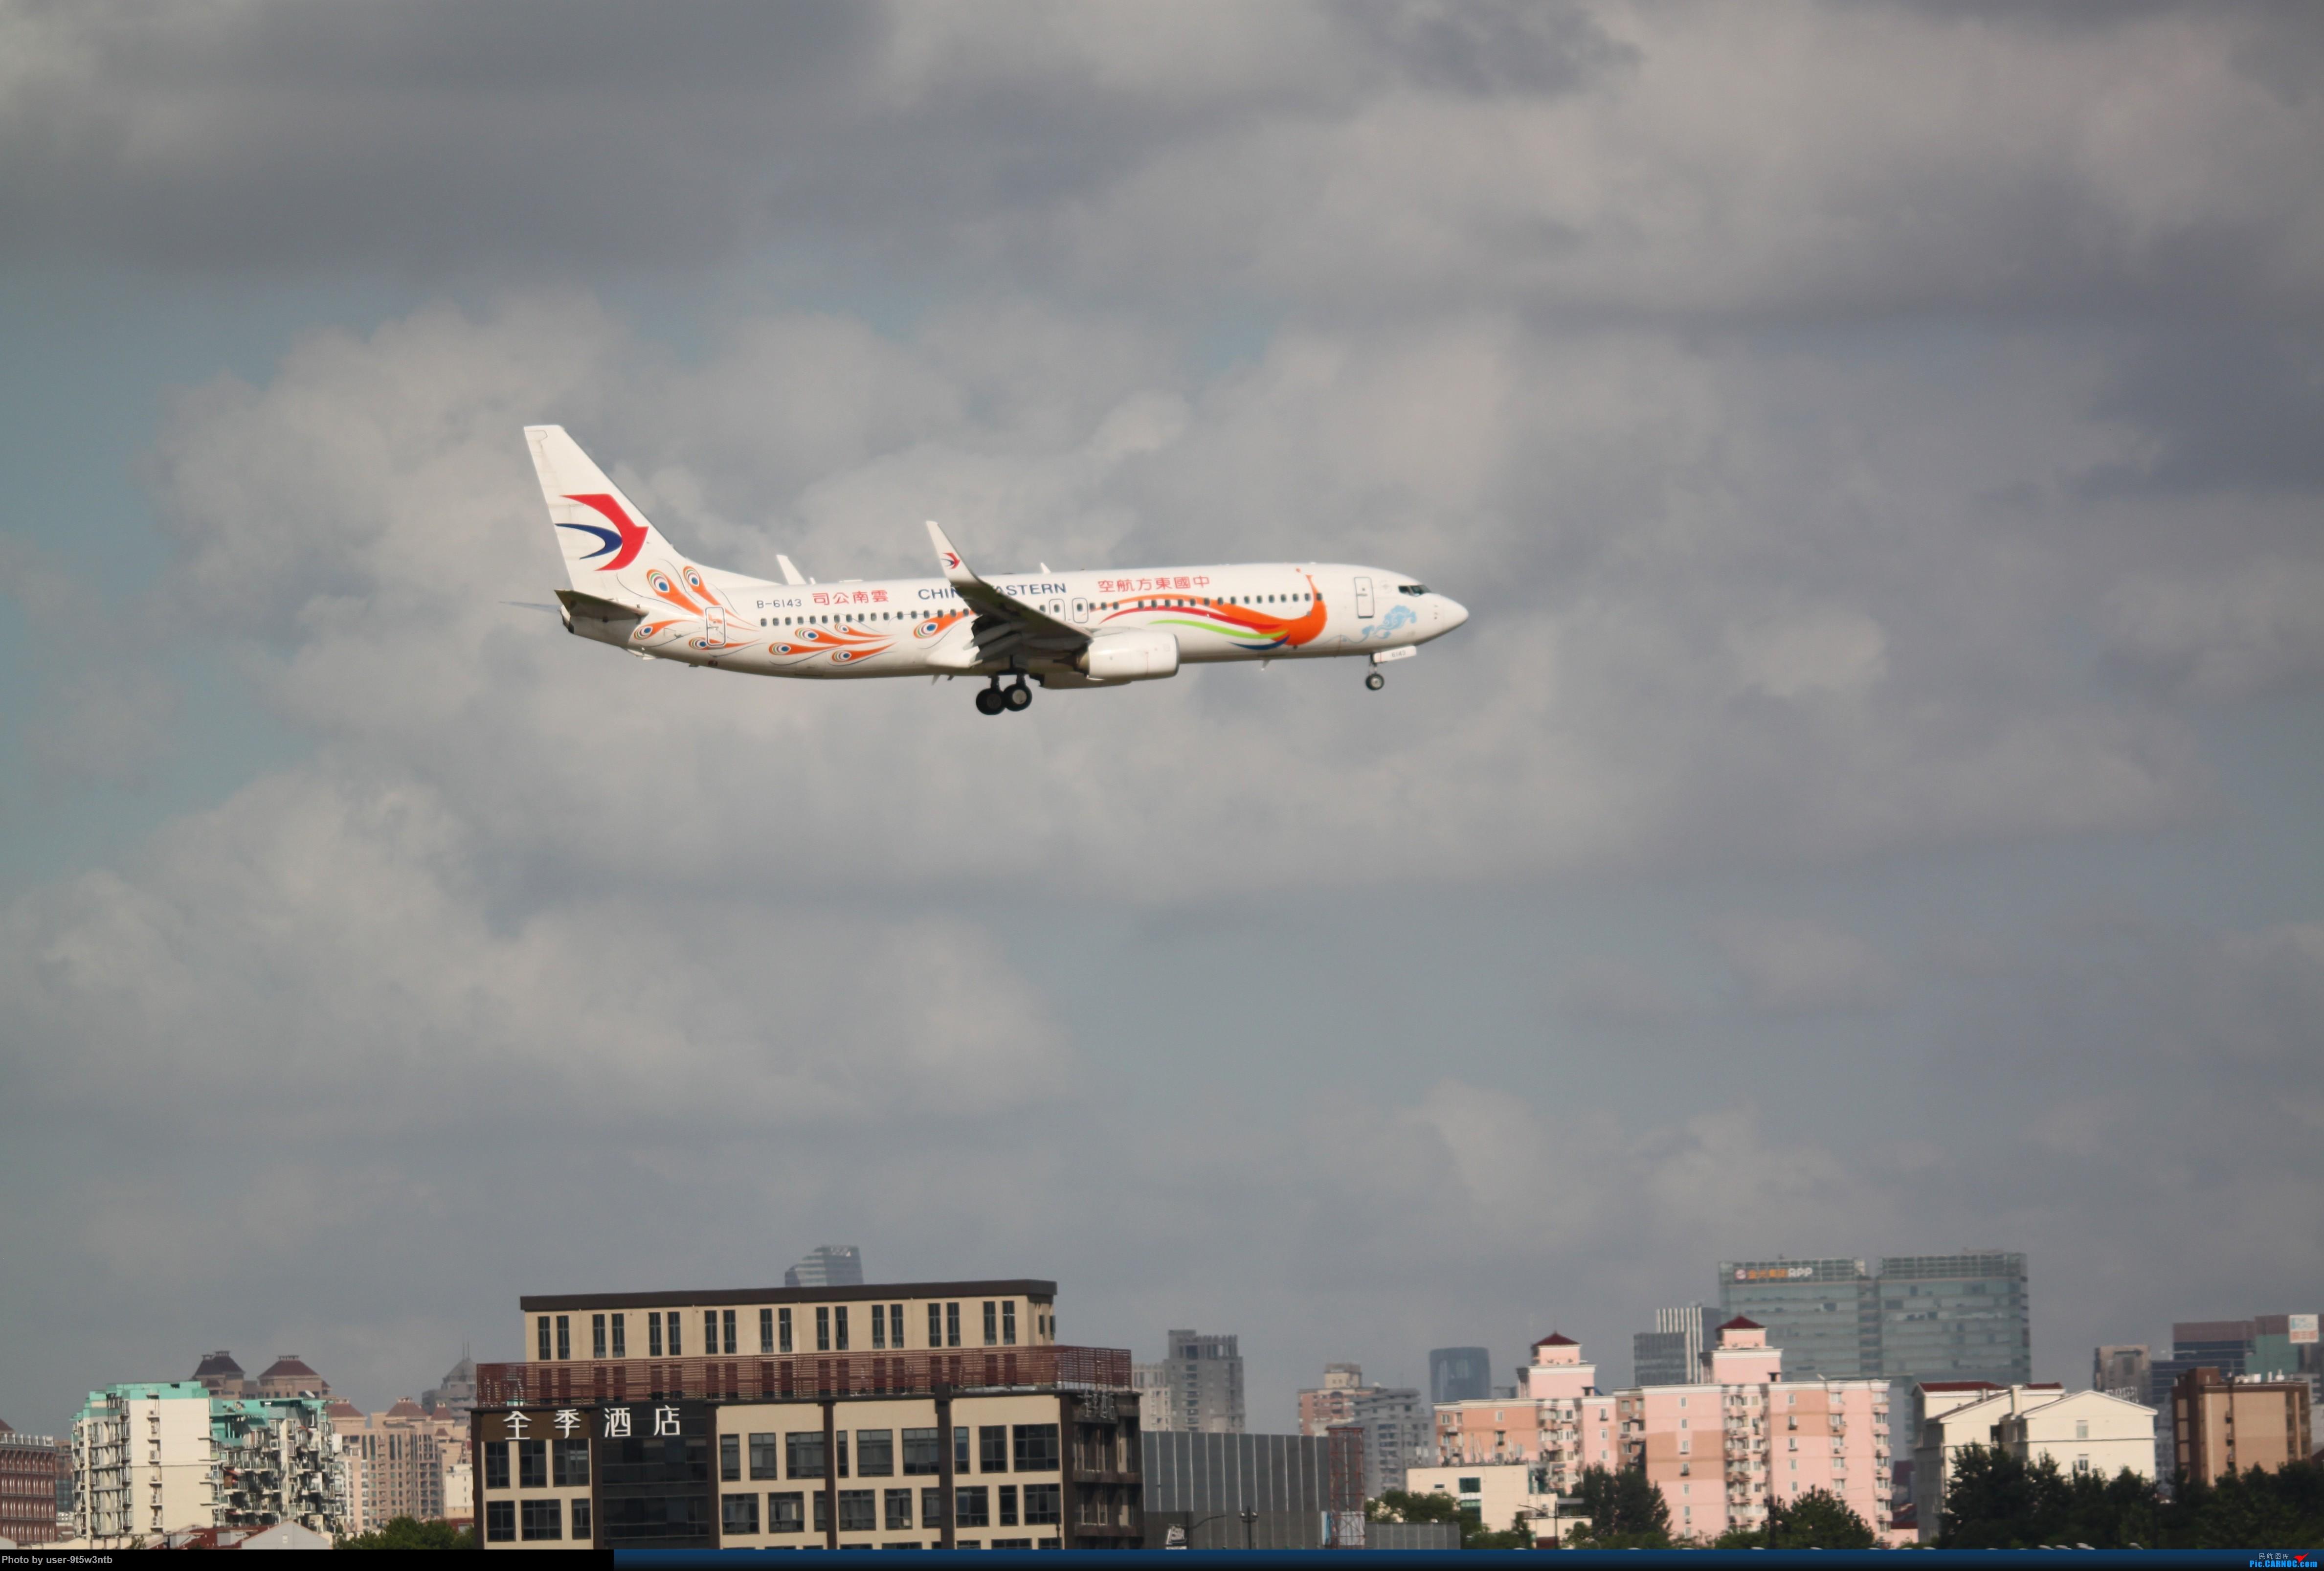 Re:[原创]来整理下最近在虹桥拍到的彩绘机吧~ BOEING 737-800 B-6143 中国上海虹桥国际机场